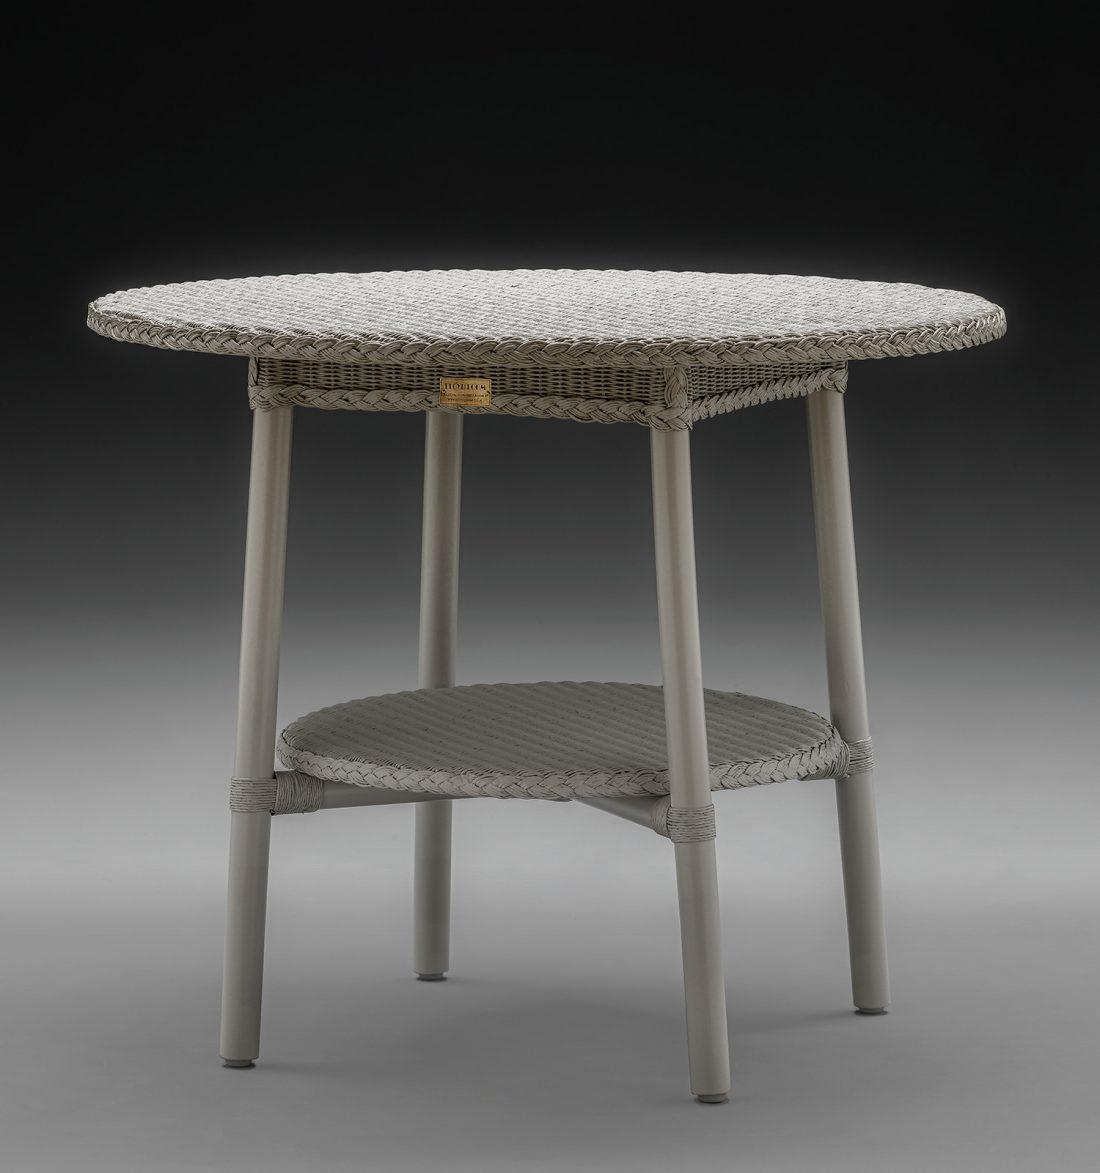 Lloyd Loom Café Table In Chelsea Grey